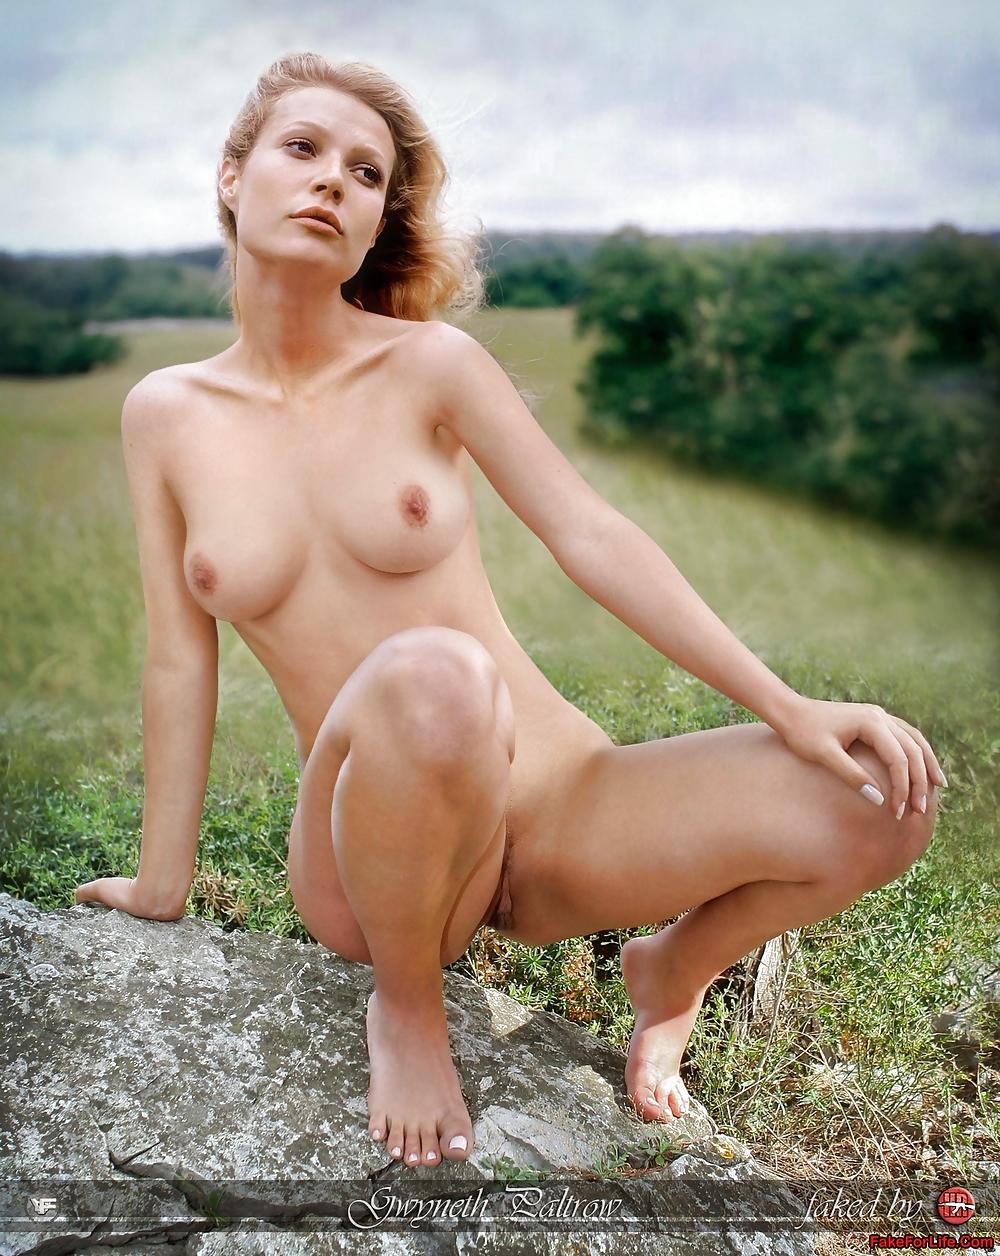 Gwyneth Paltrow Nude Pics Nsfw Leaks Celebs Unmasked